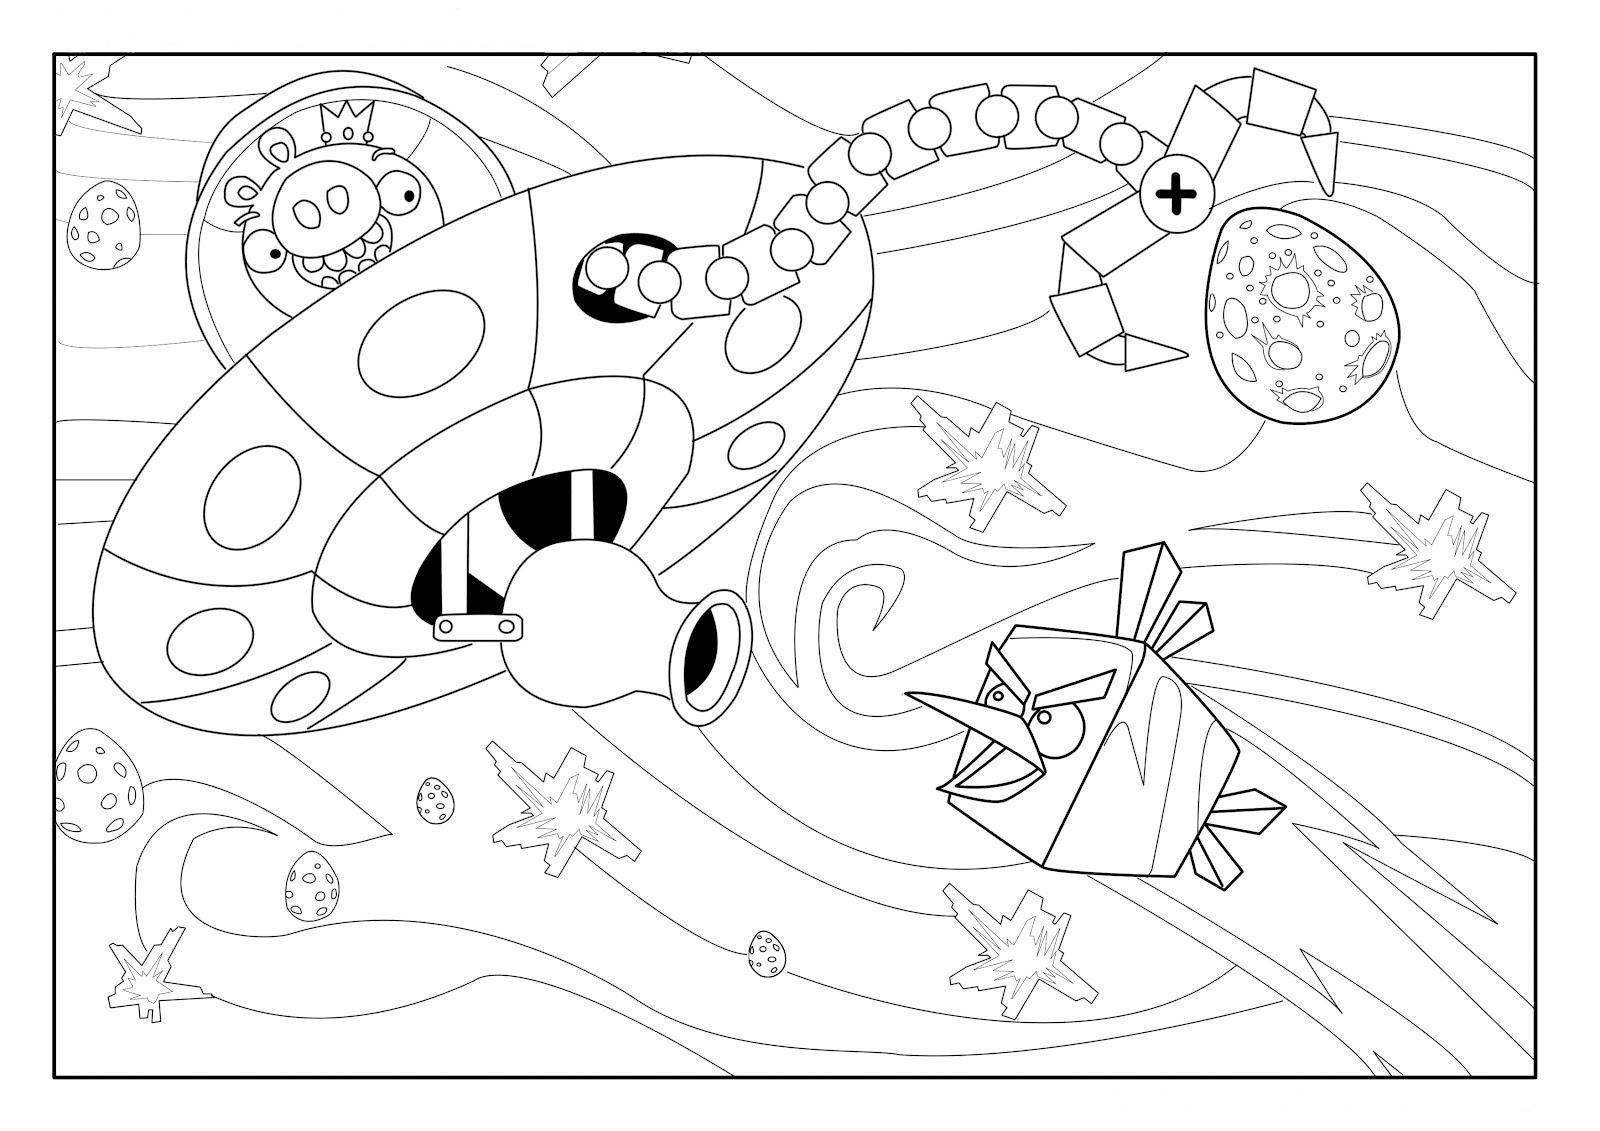 Dibujos Para Colorear Angry Birds 4 Paginas Para Colorear Dibujos Para Colorear Dibujos Para Imprimir [ 1131 x 1600 Pixel ]